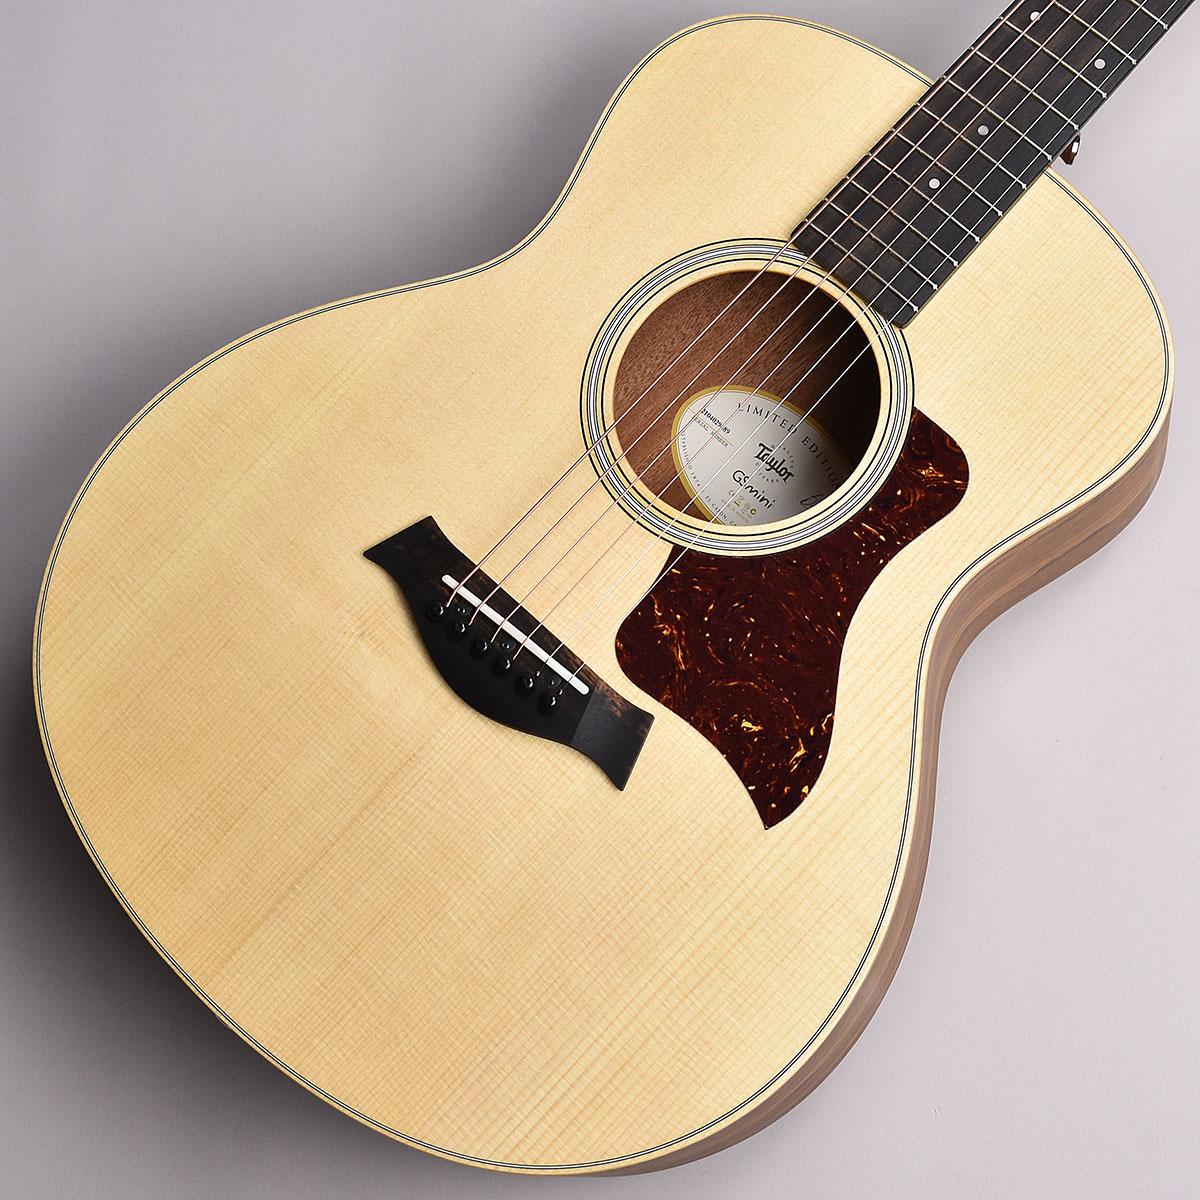 Taylor GS Mini-e Ovangkol Limited S/N:2104029489 ミニアコースティックギター【エレアコ】 【テイラー】【未展示品】